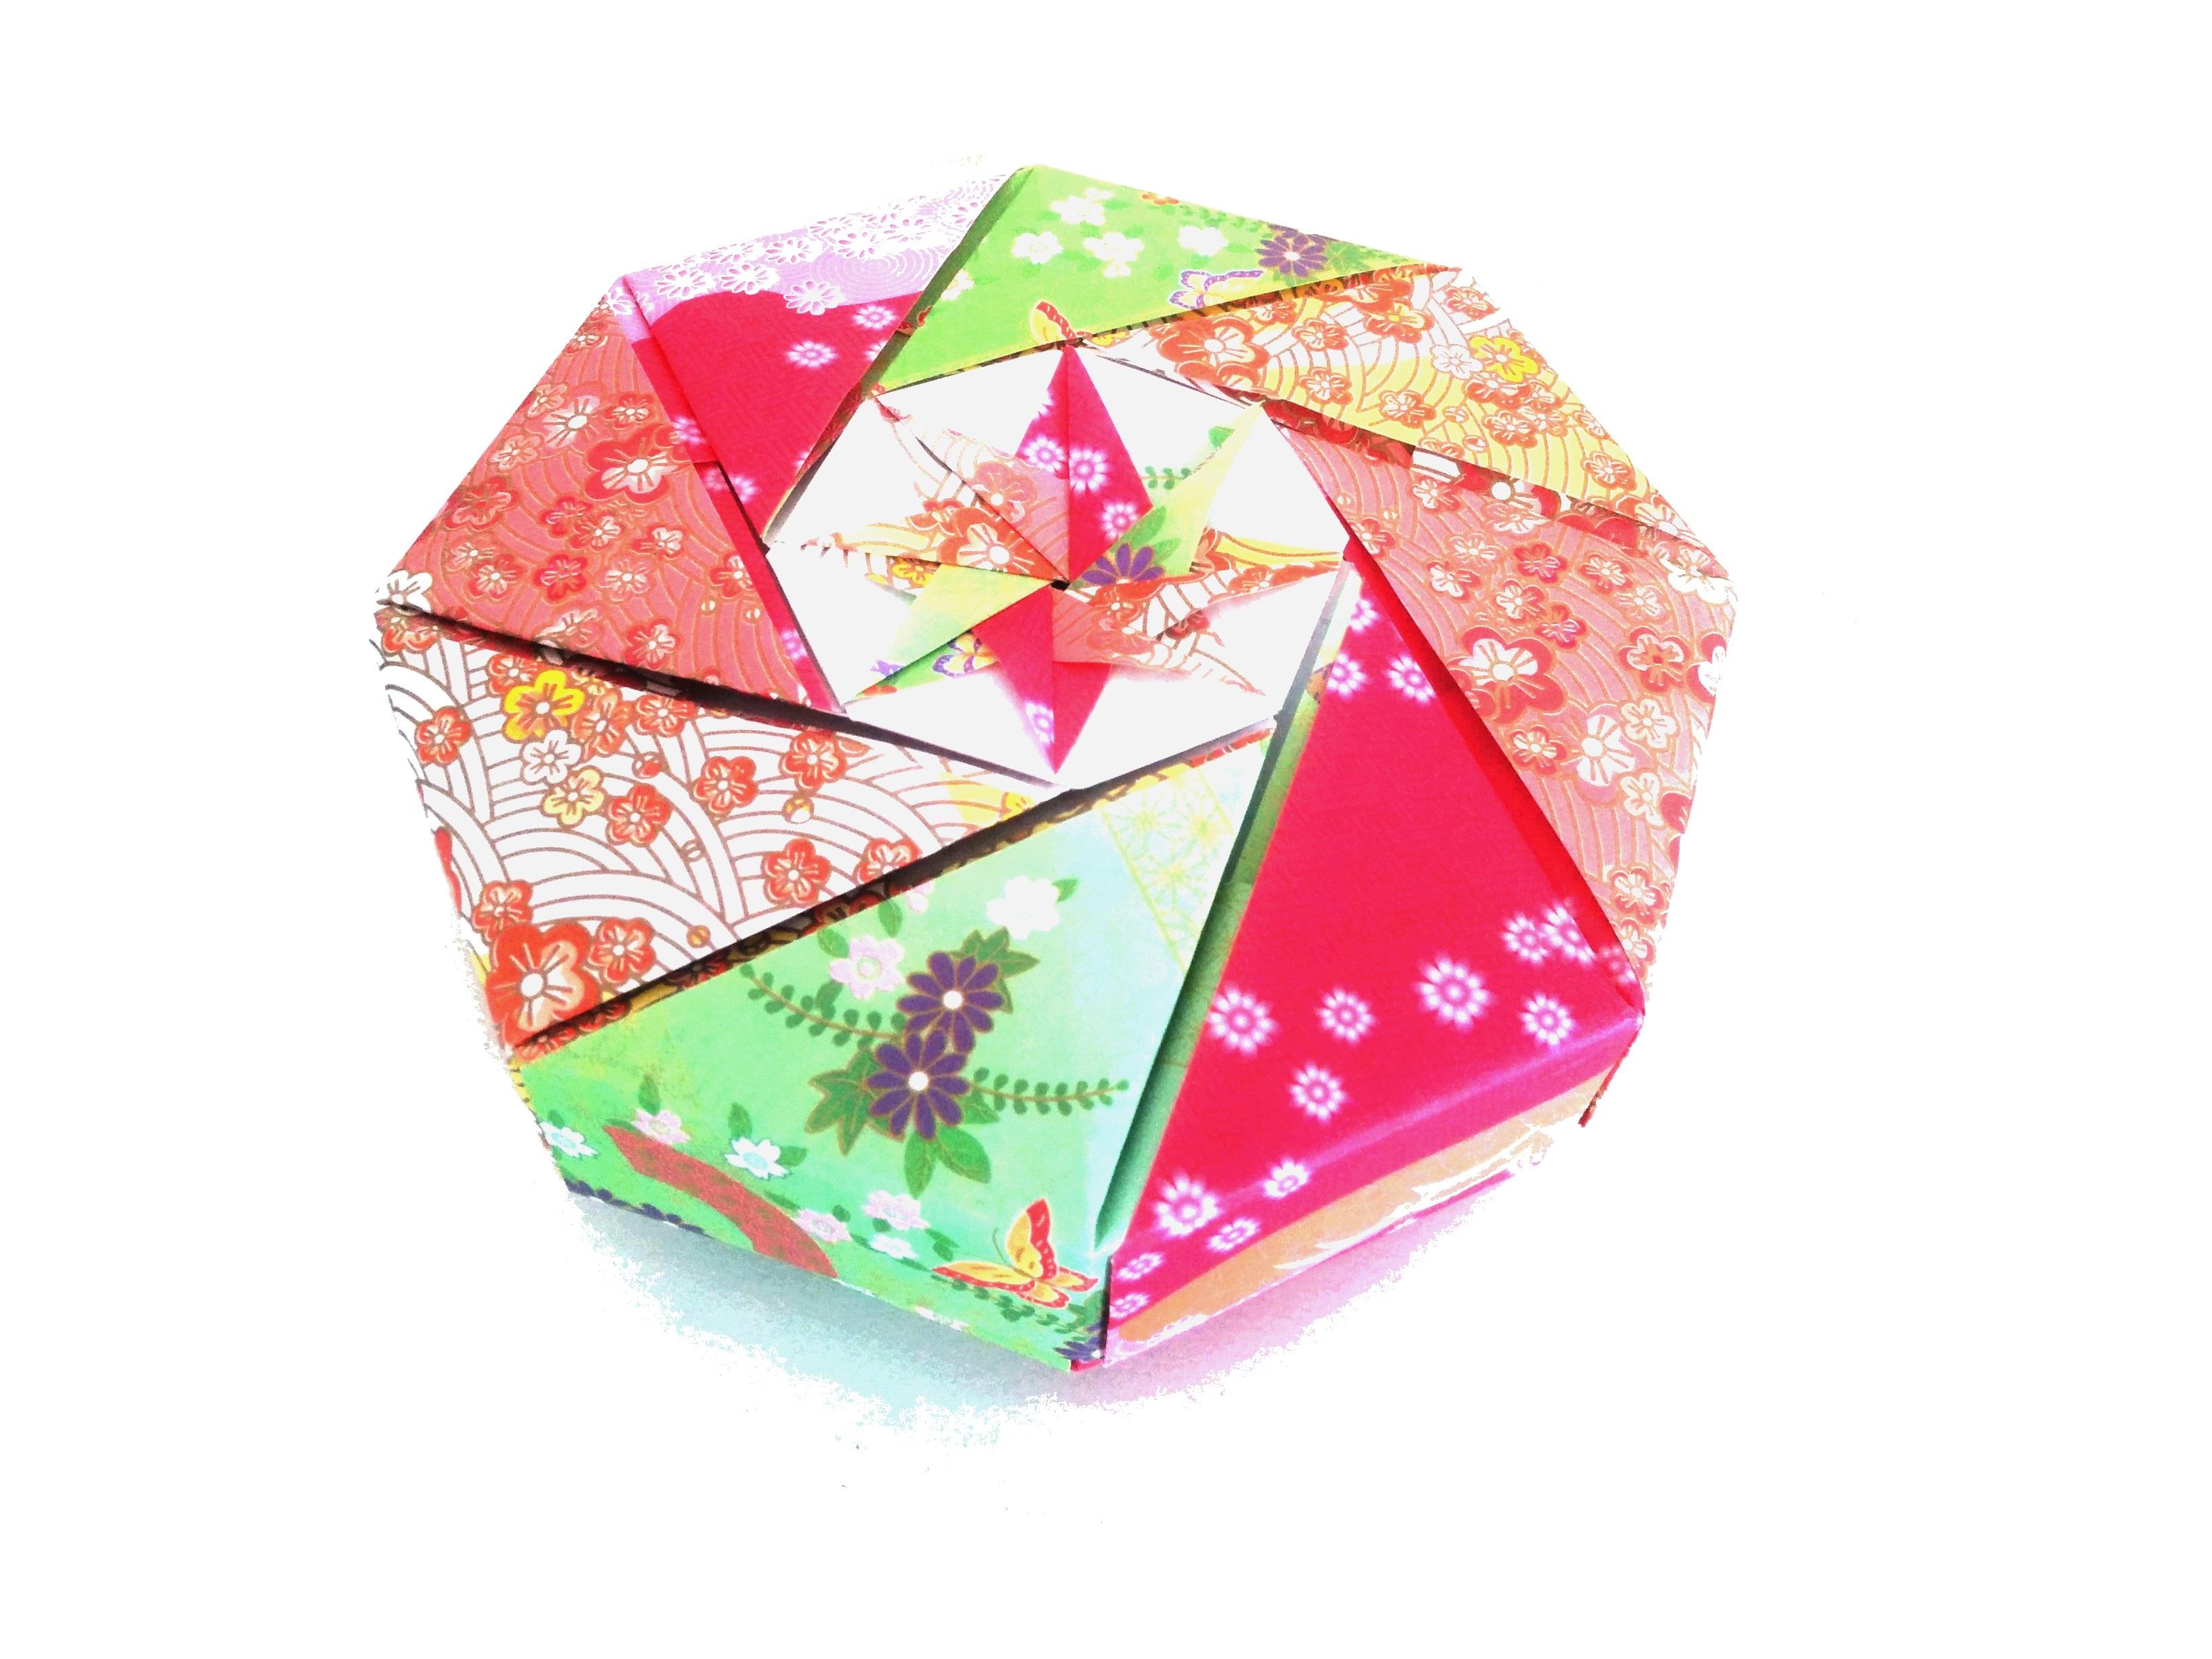 Heart Gift Box Pink Japan Paper Art Shape Origami Japanese Patterns